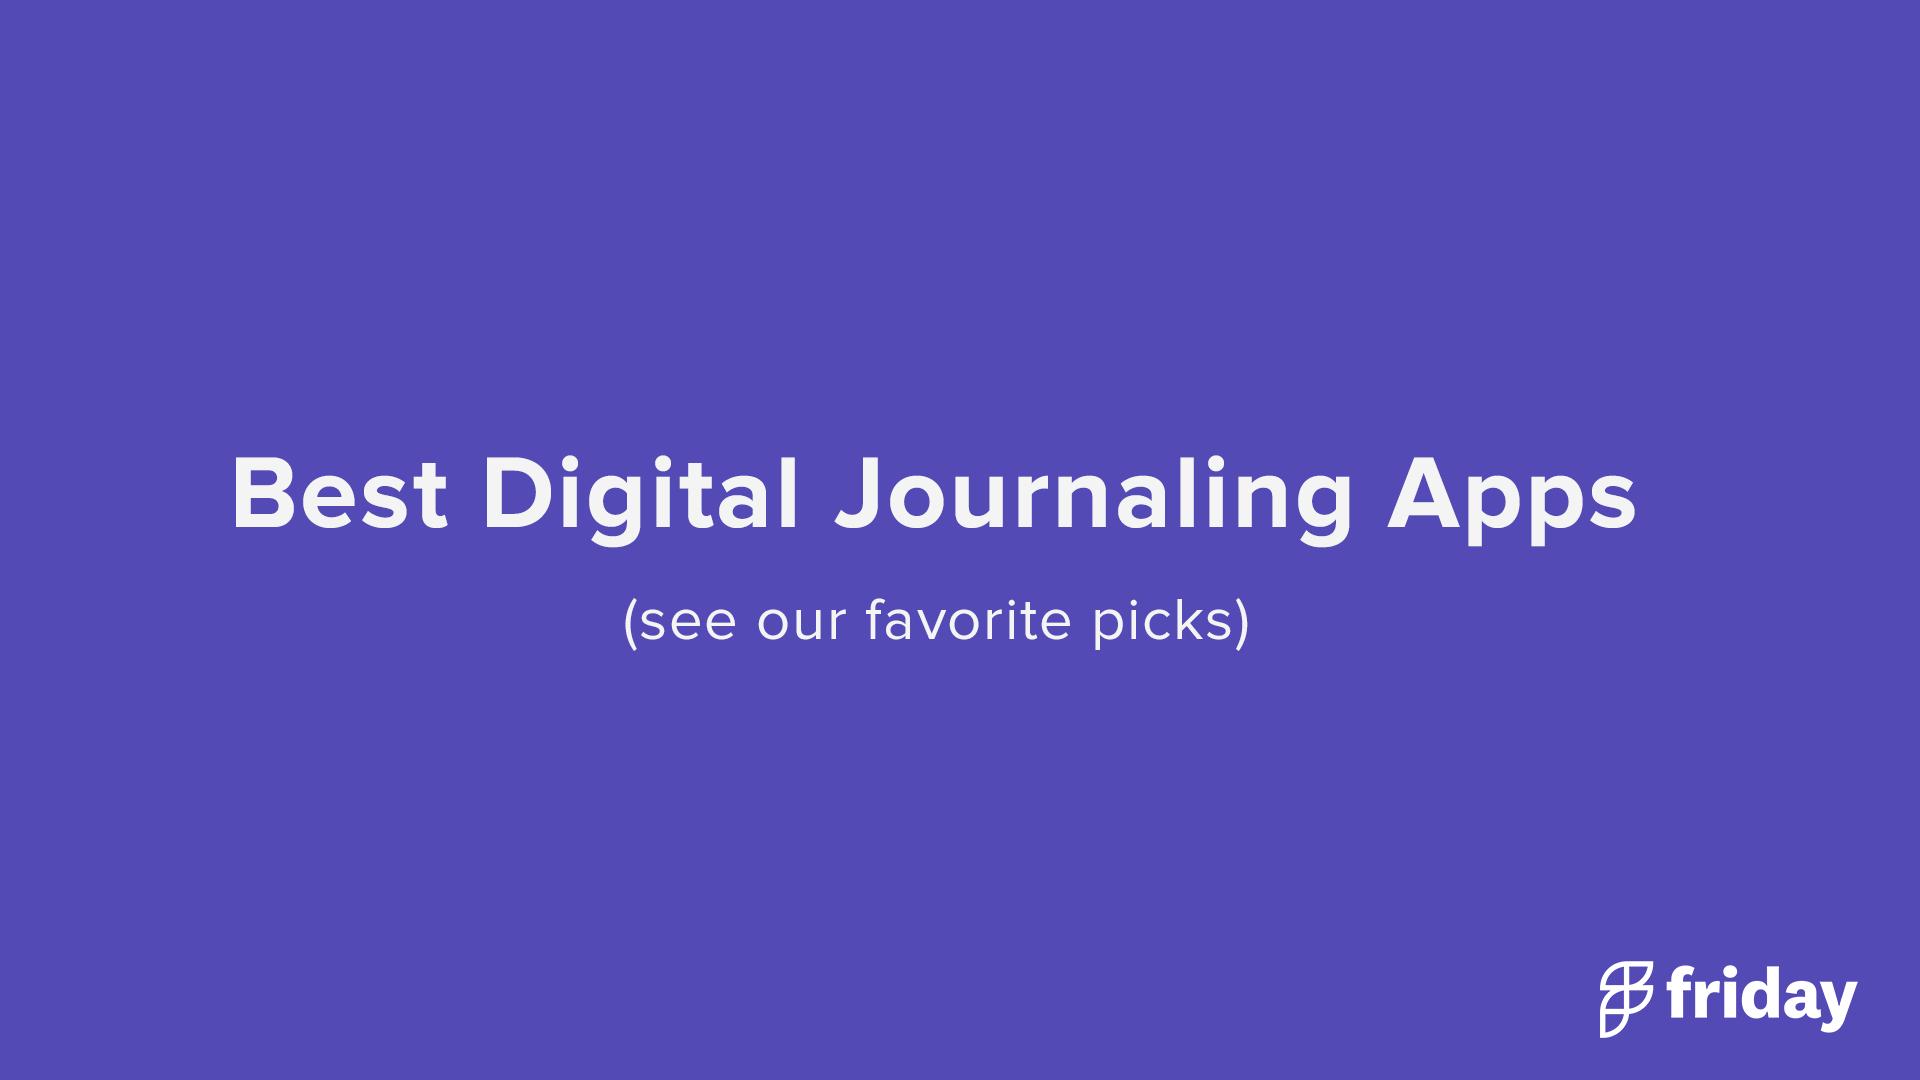 Best Digital Journaling Apps